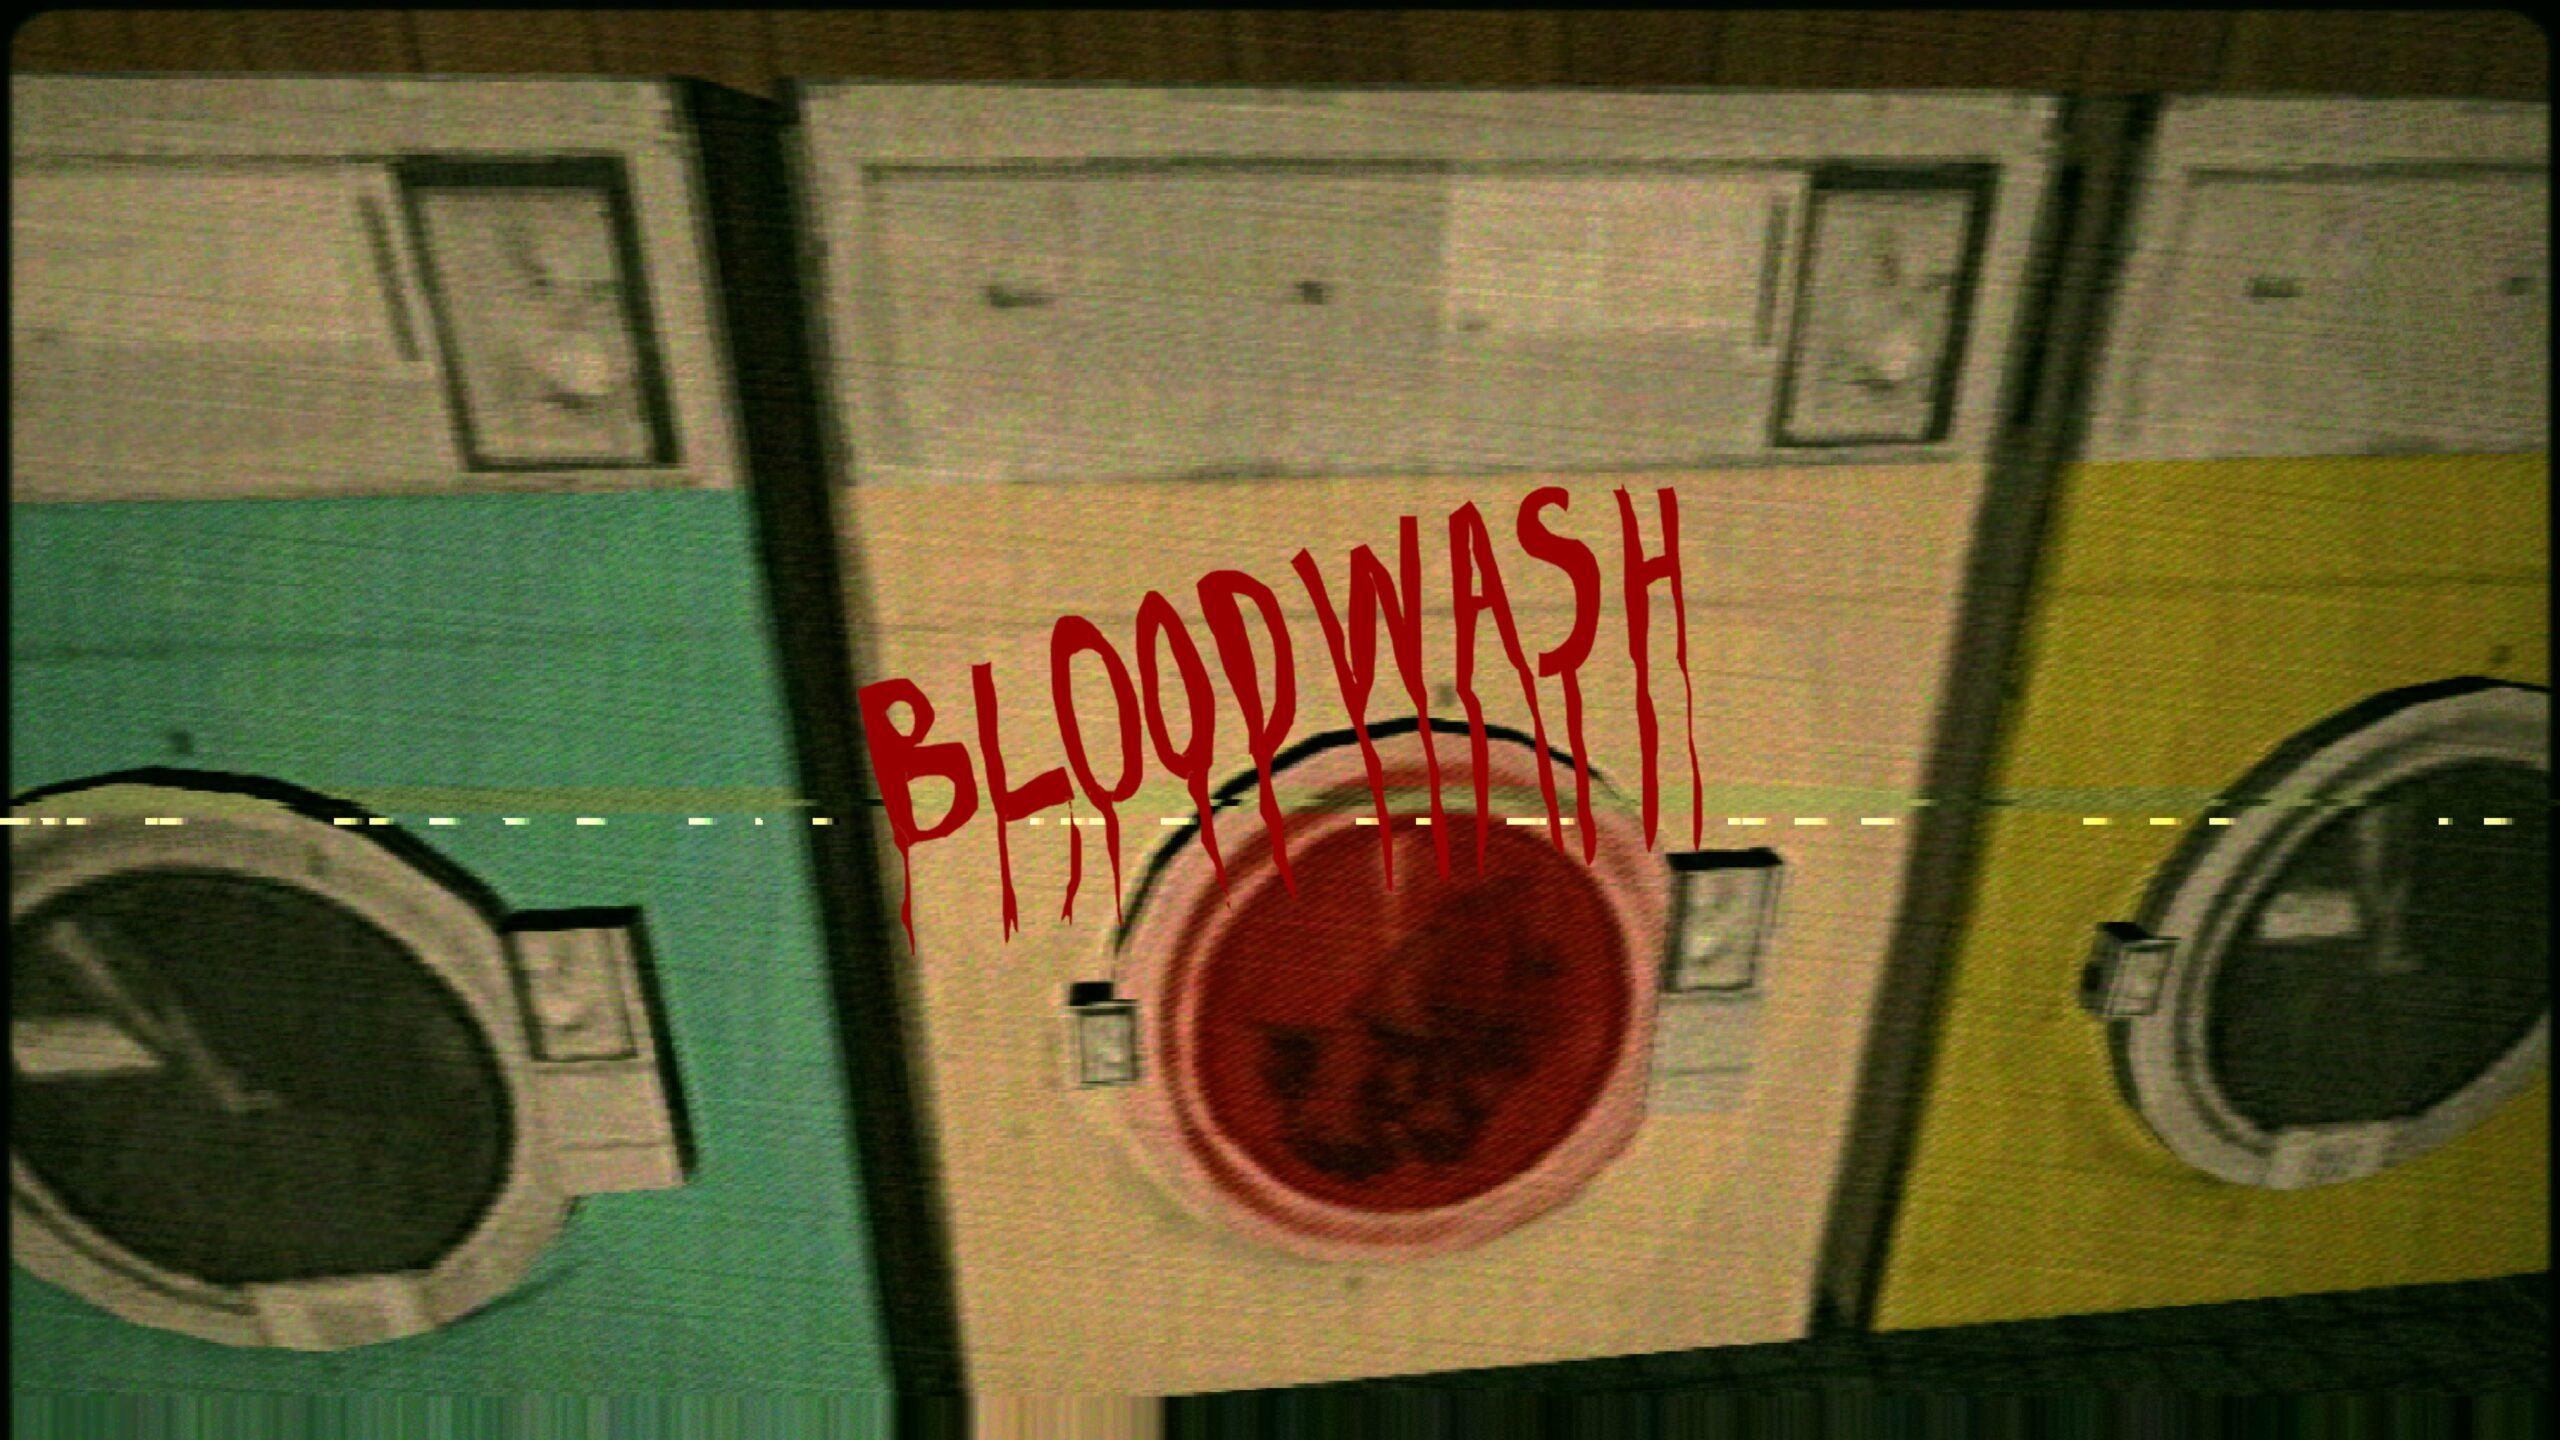 Bloodwash Opening Credits